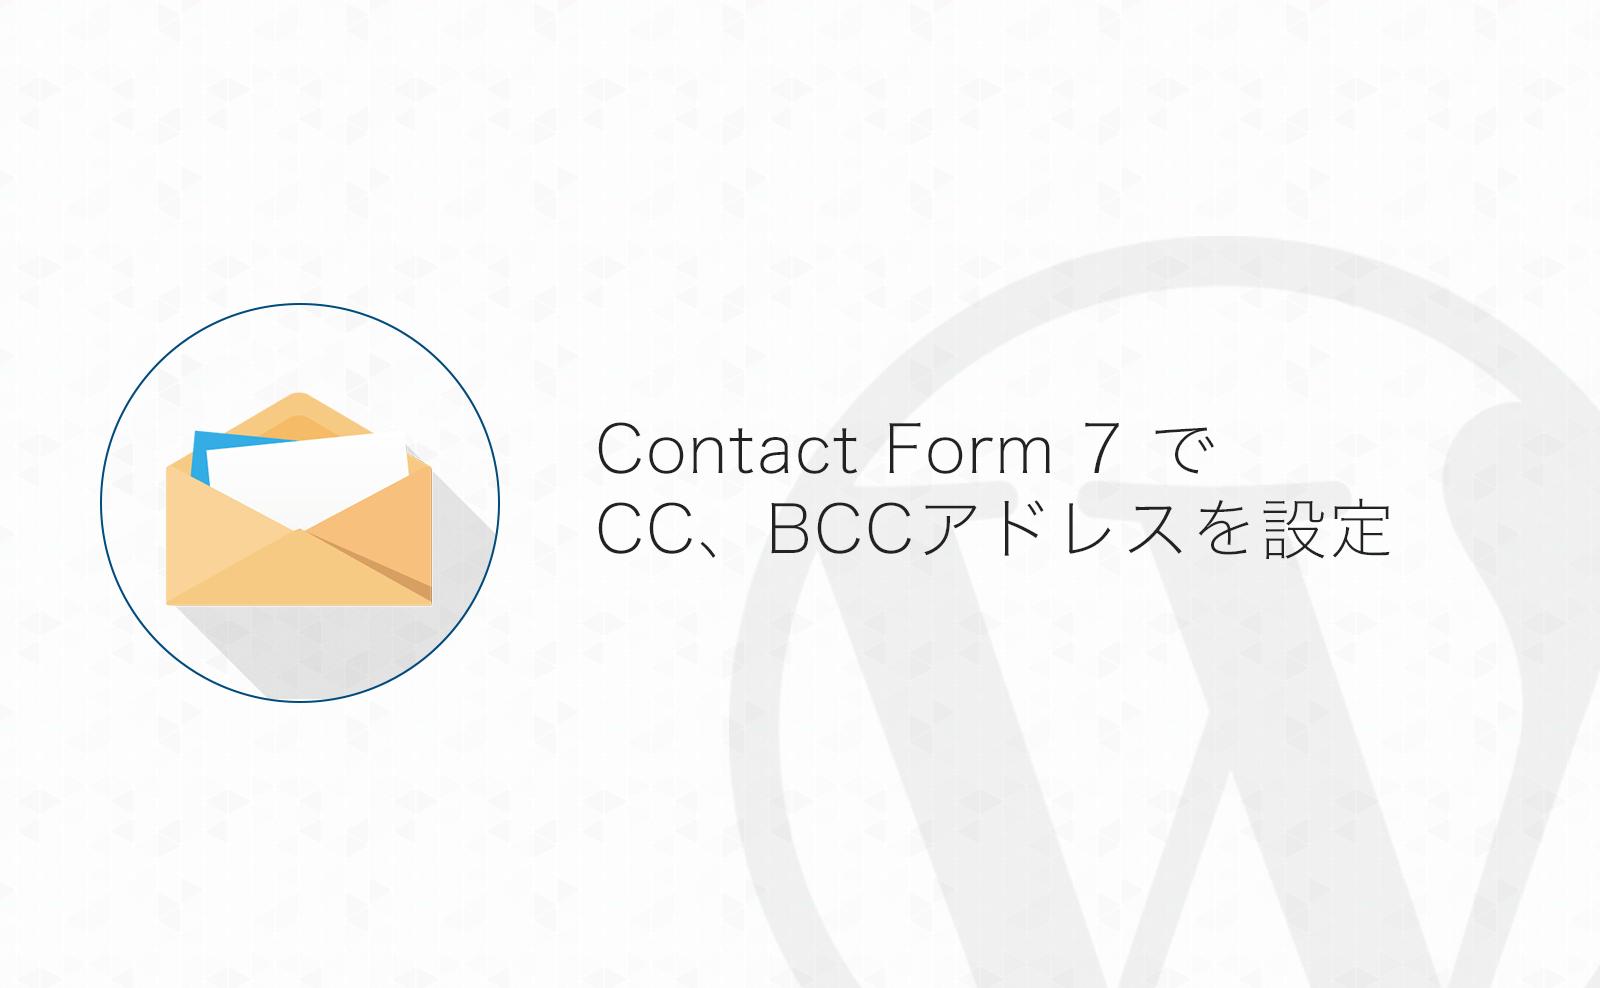 【WordPress】Contact Form 7 でCC、BCCアドレスを追加する方法